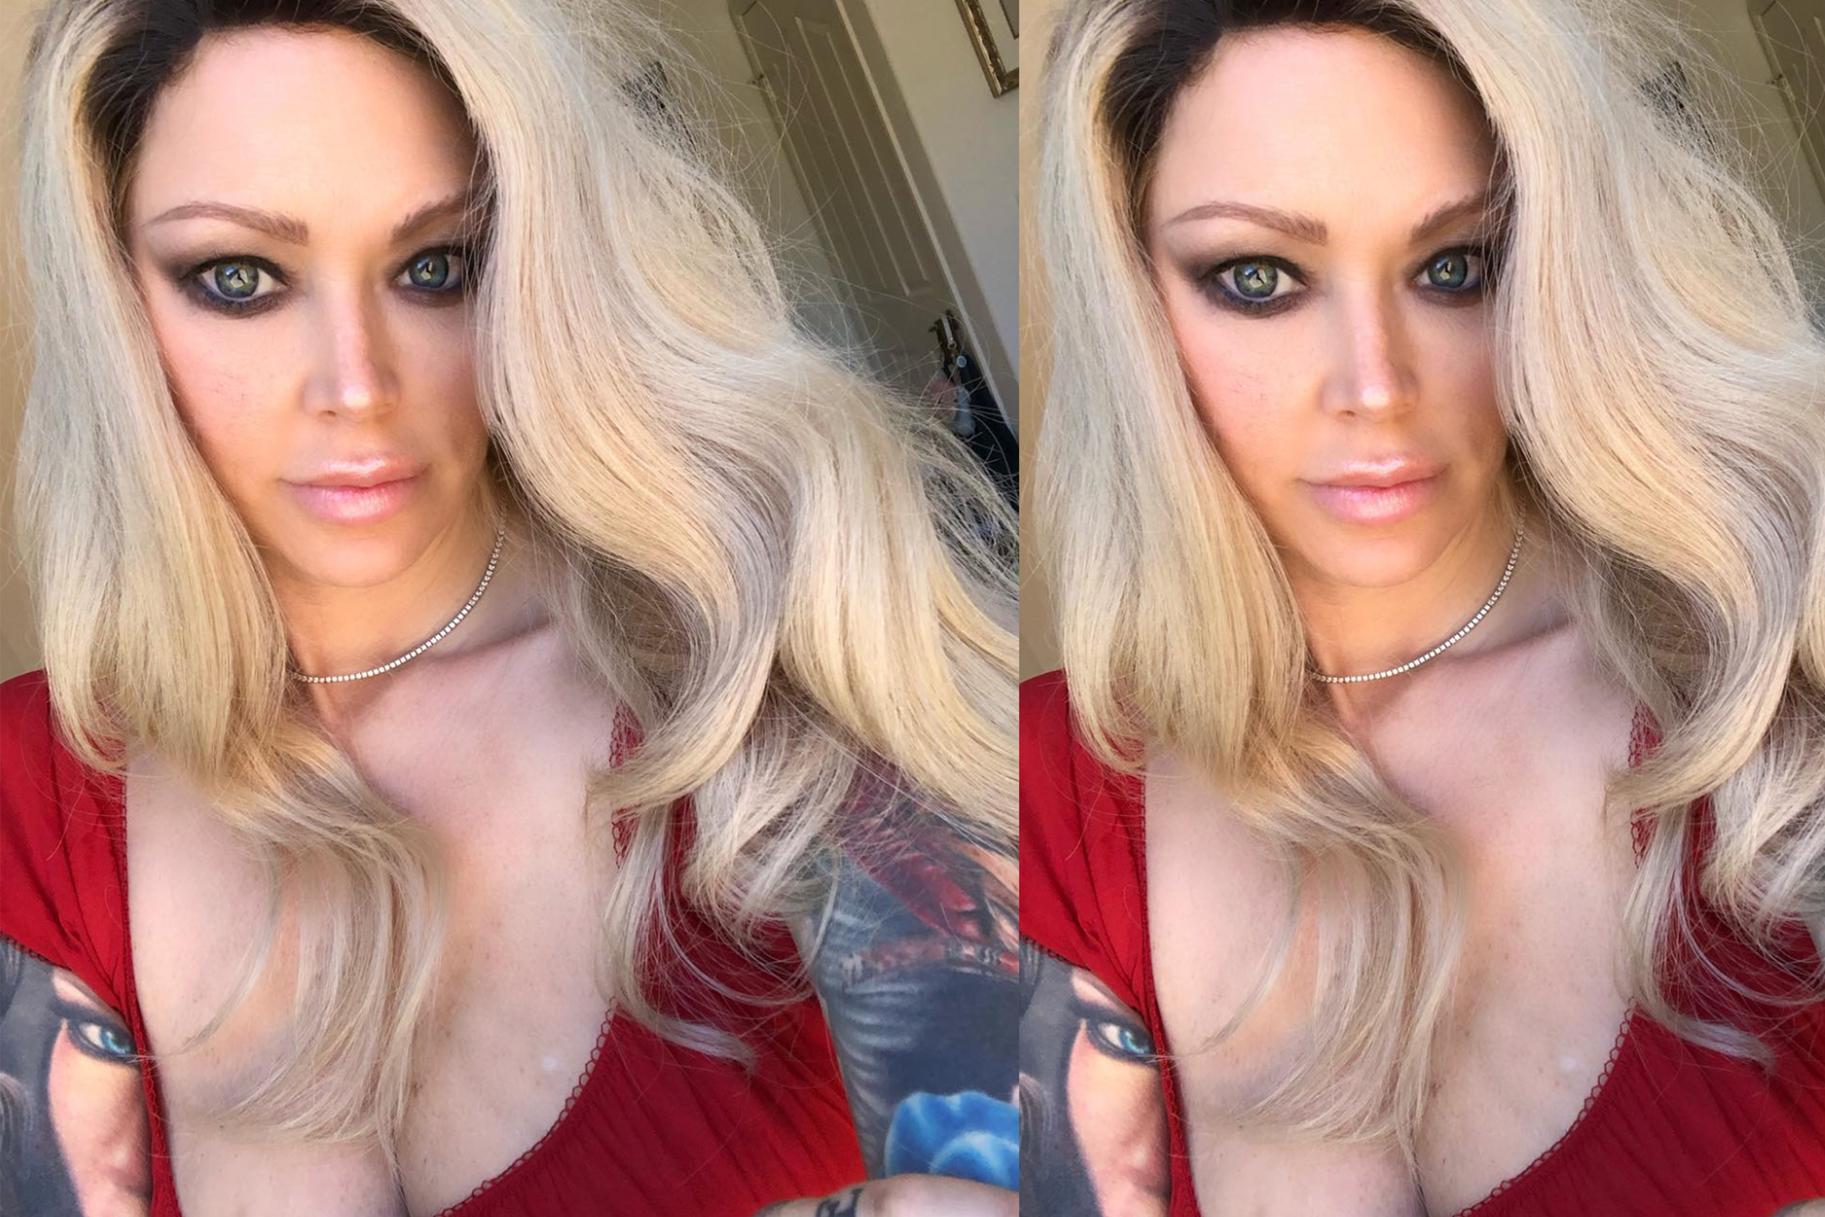 Jenna Jameson Keto Instagram Bikini Pics